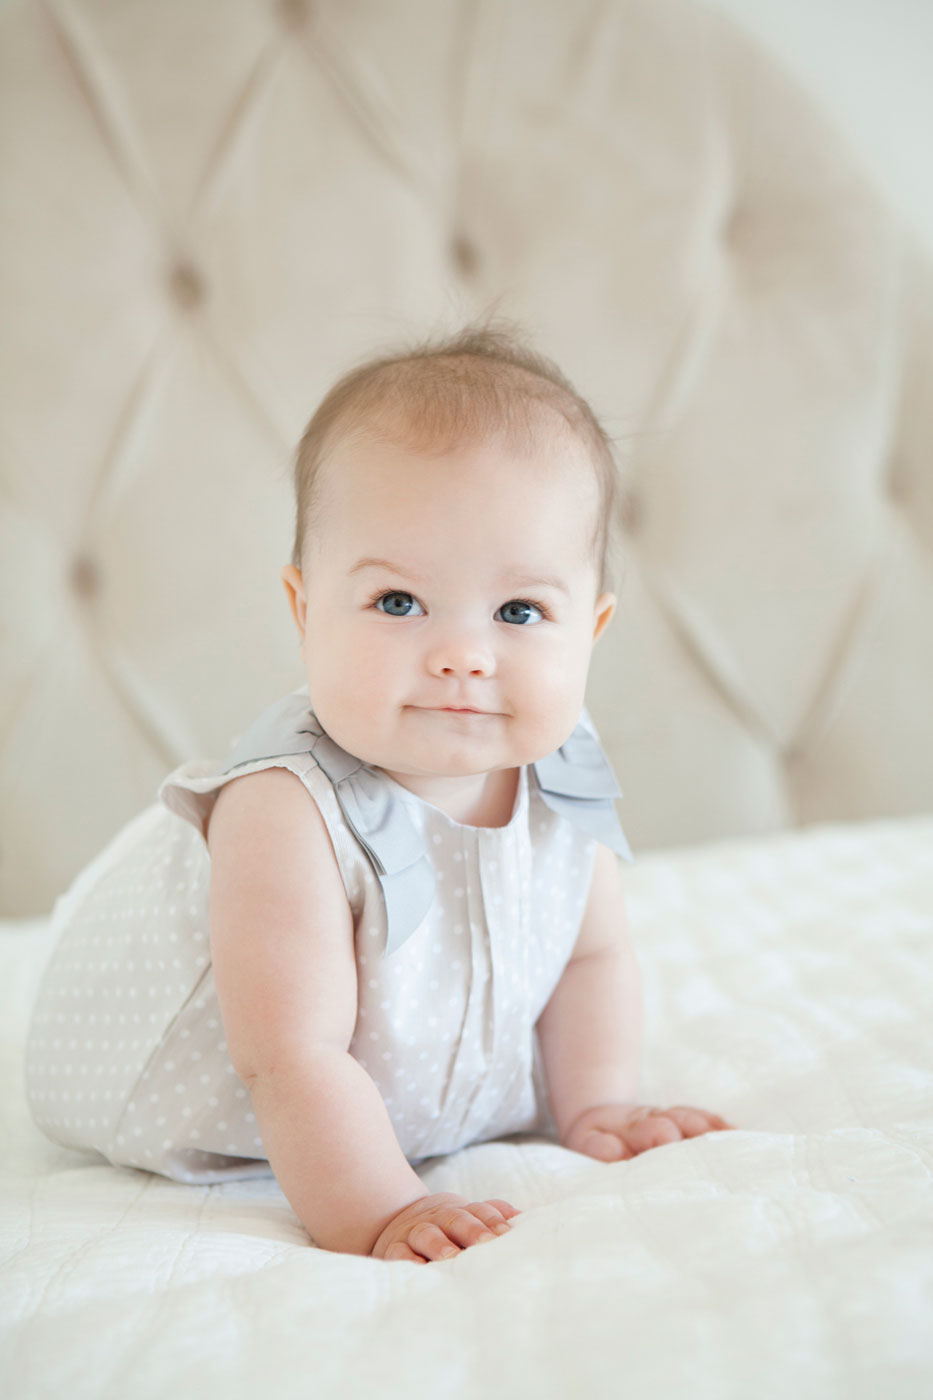 Baby_0008.jpg